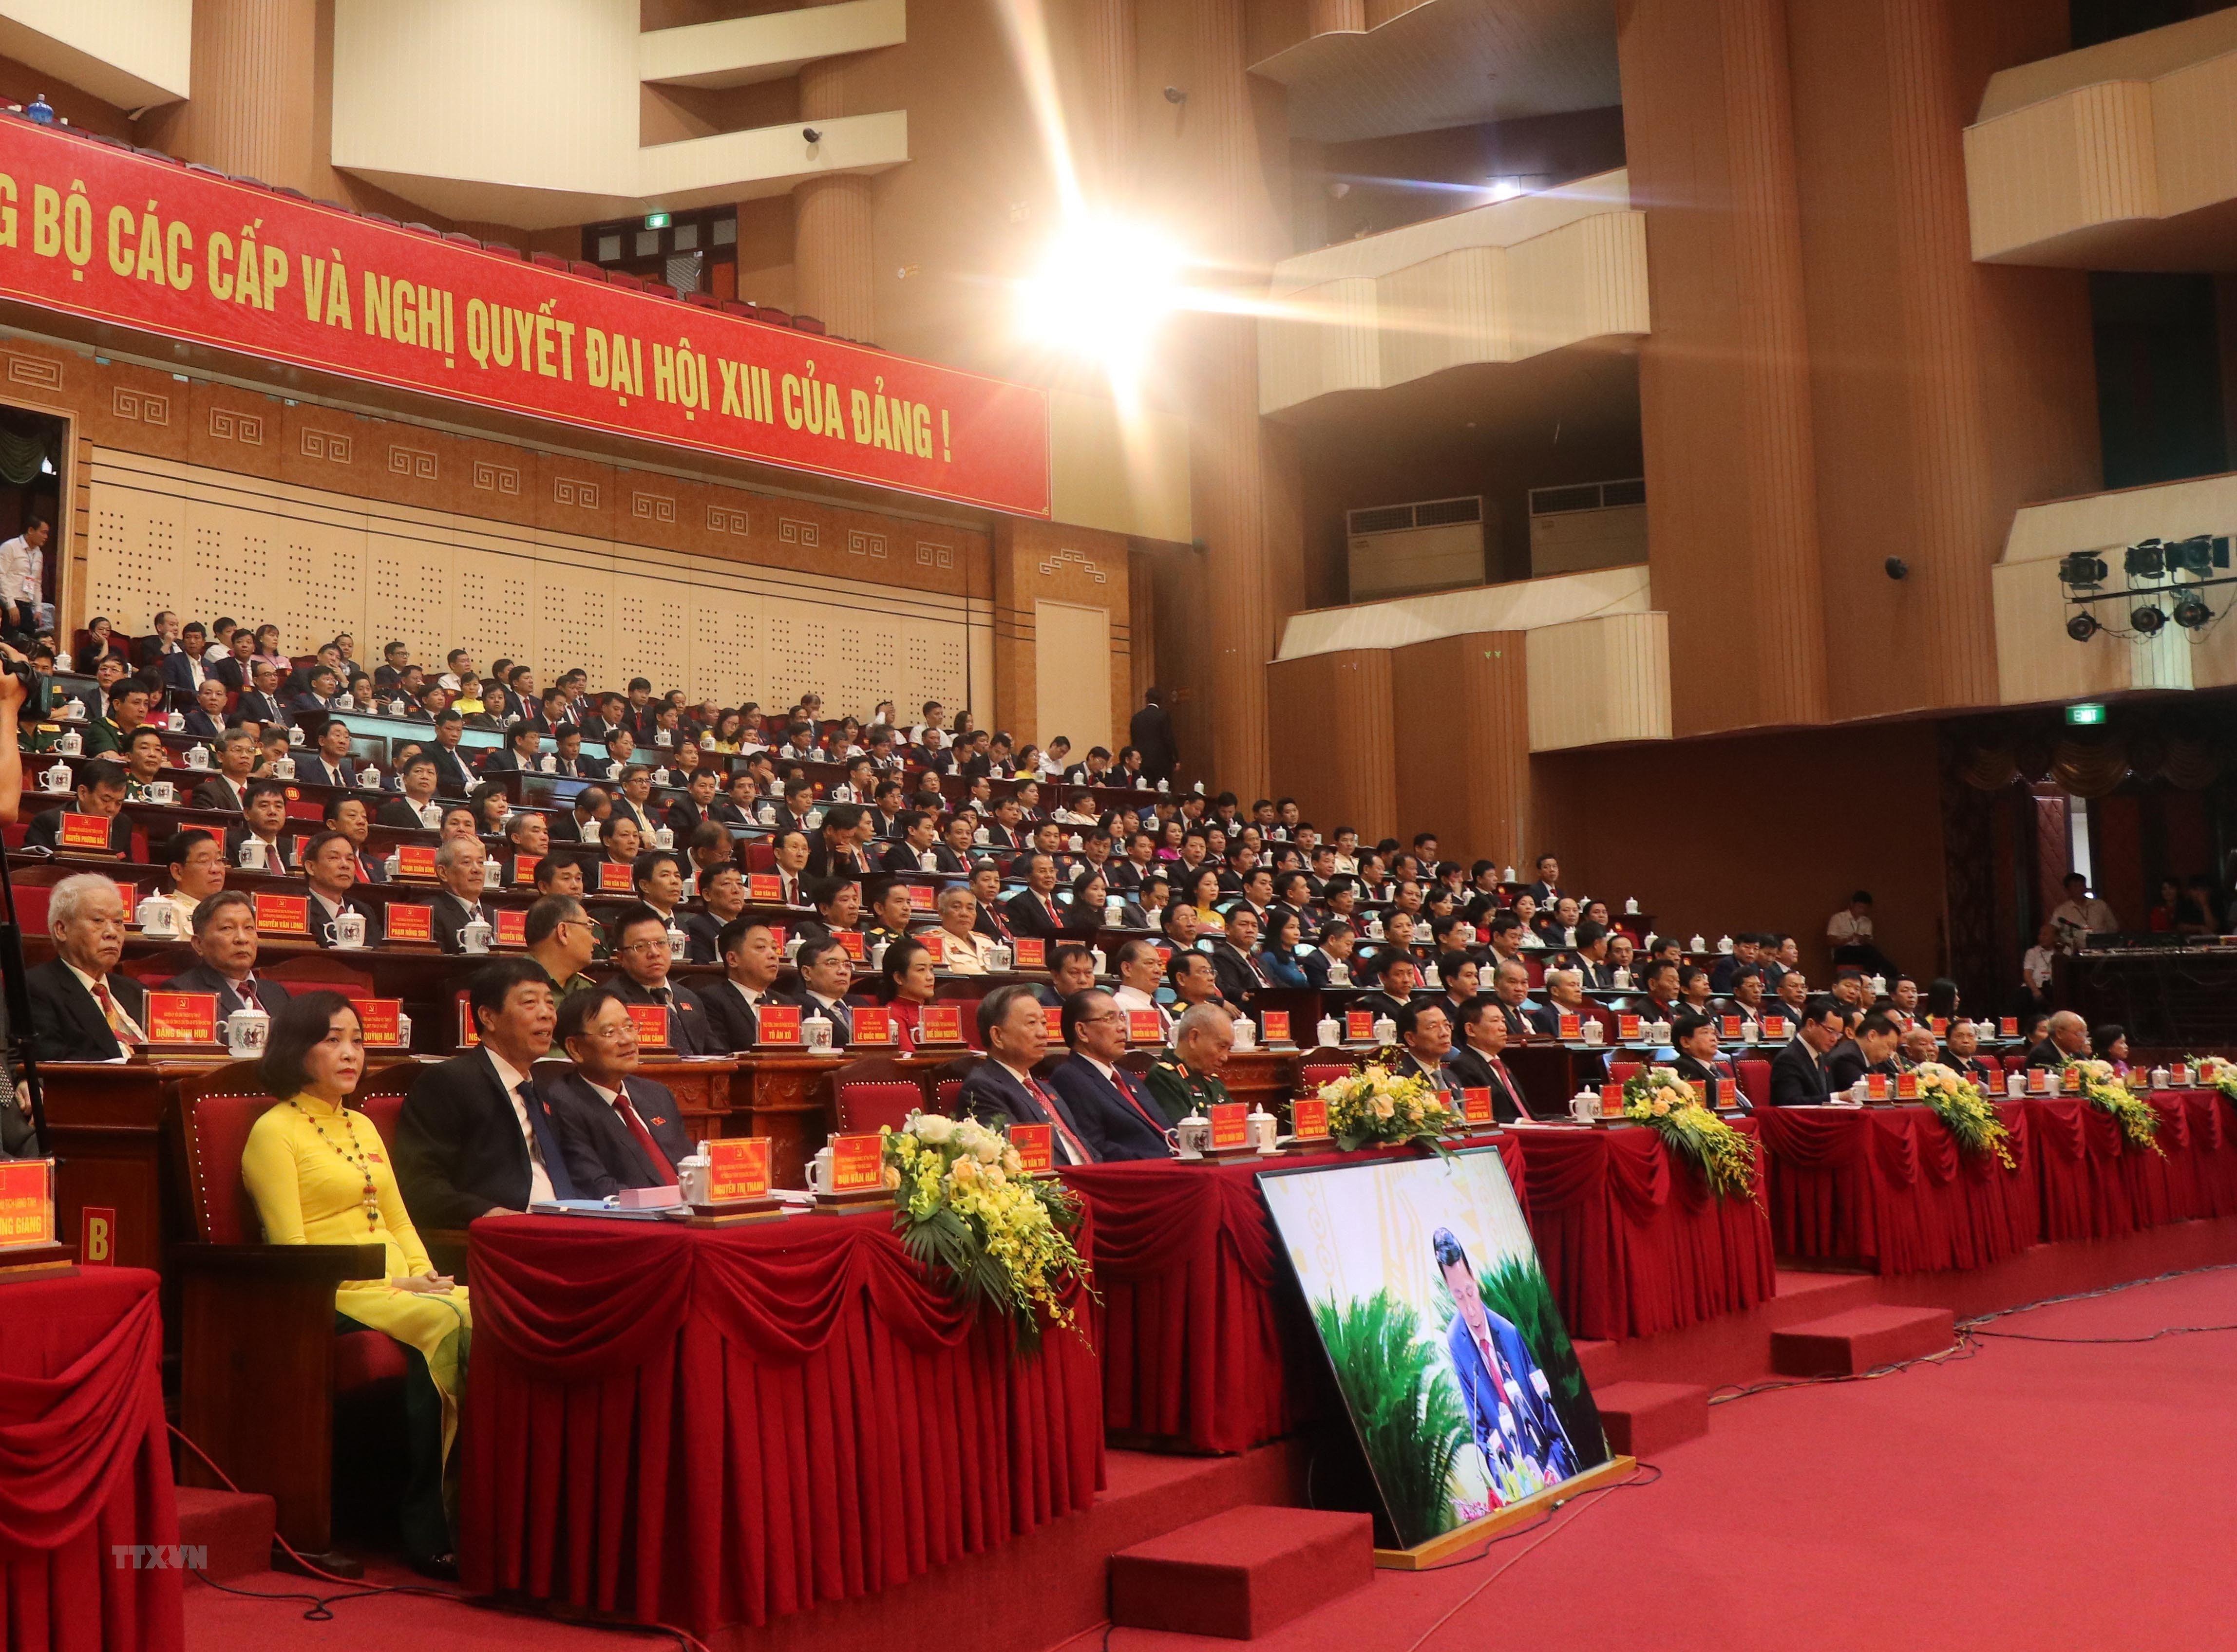 [Photo] Khai mac Dai hoi dai bieu Dang bo tinh Bac Ninh lan thu XX hinh anh 3